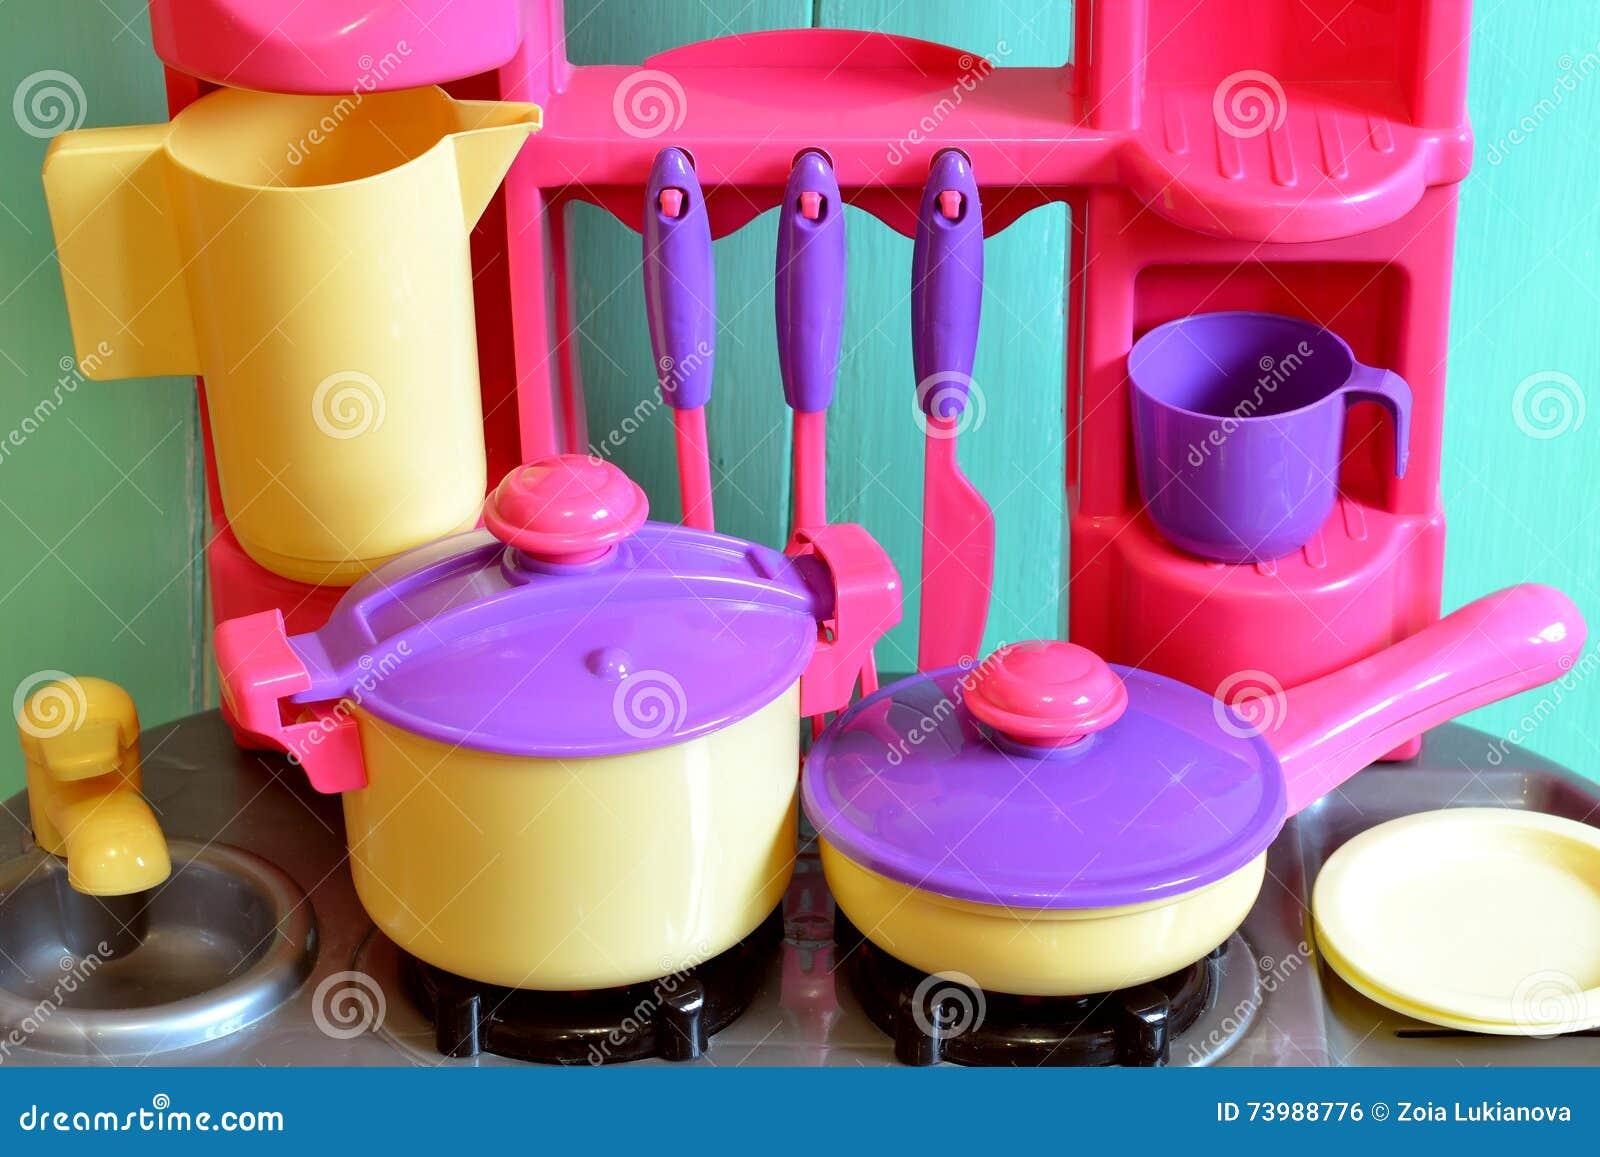 Set of kids dishes children 39 s toys kitchen utensils for Kitchen set wala game